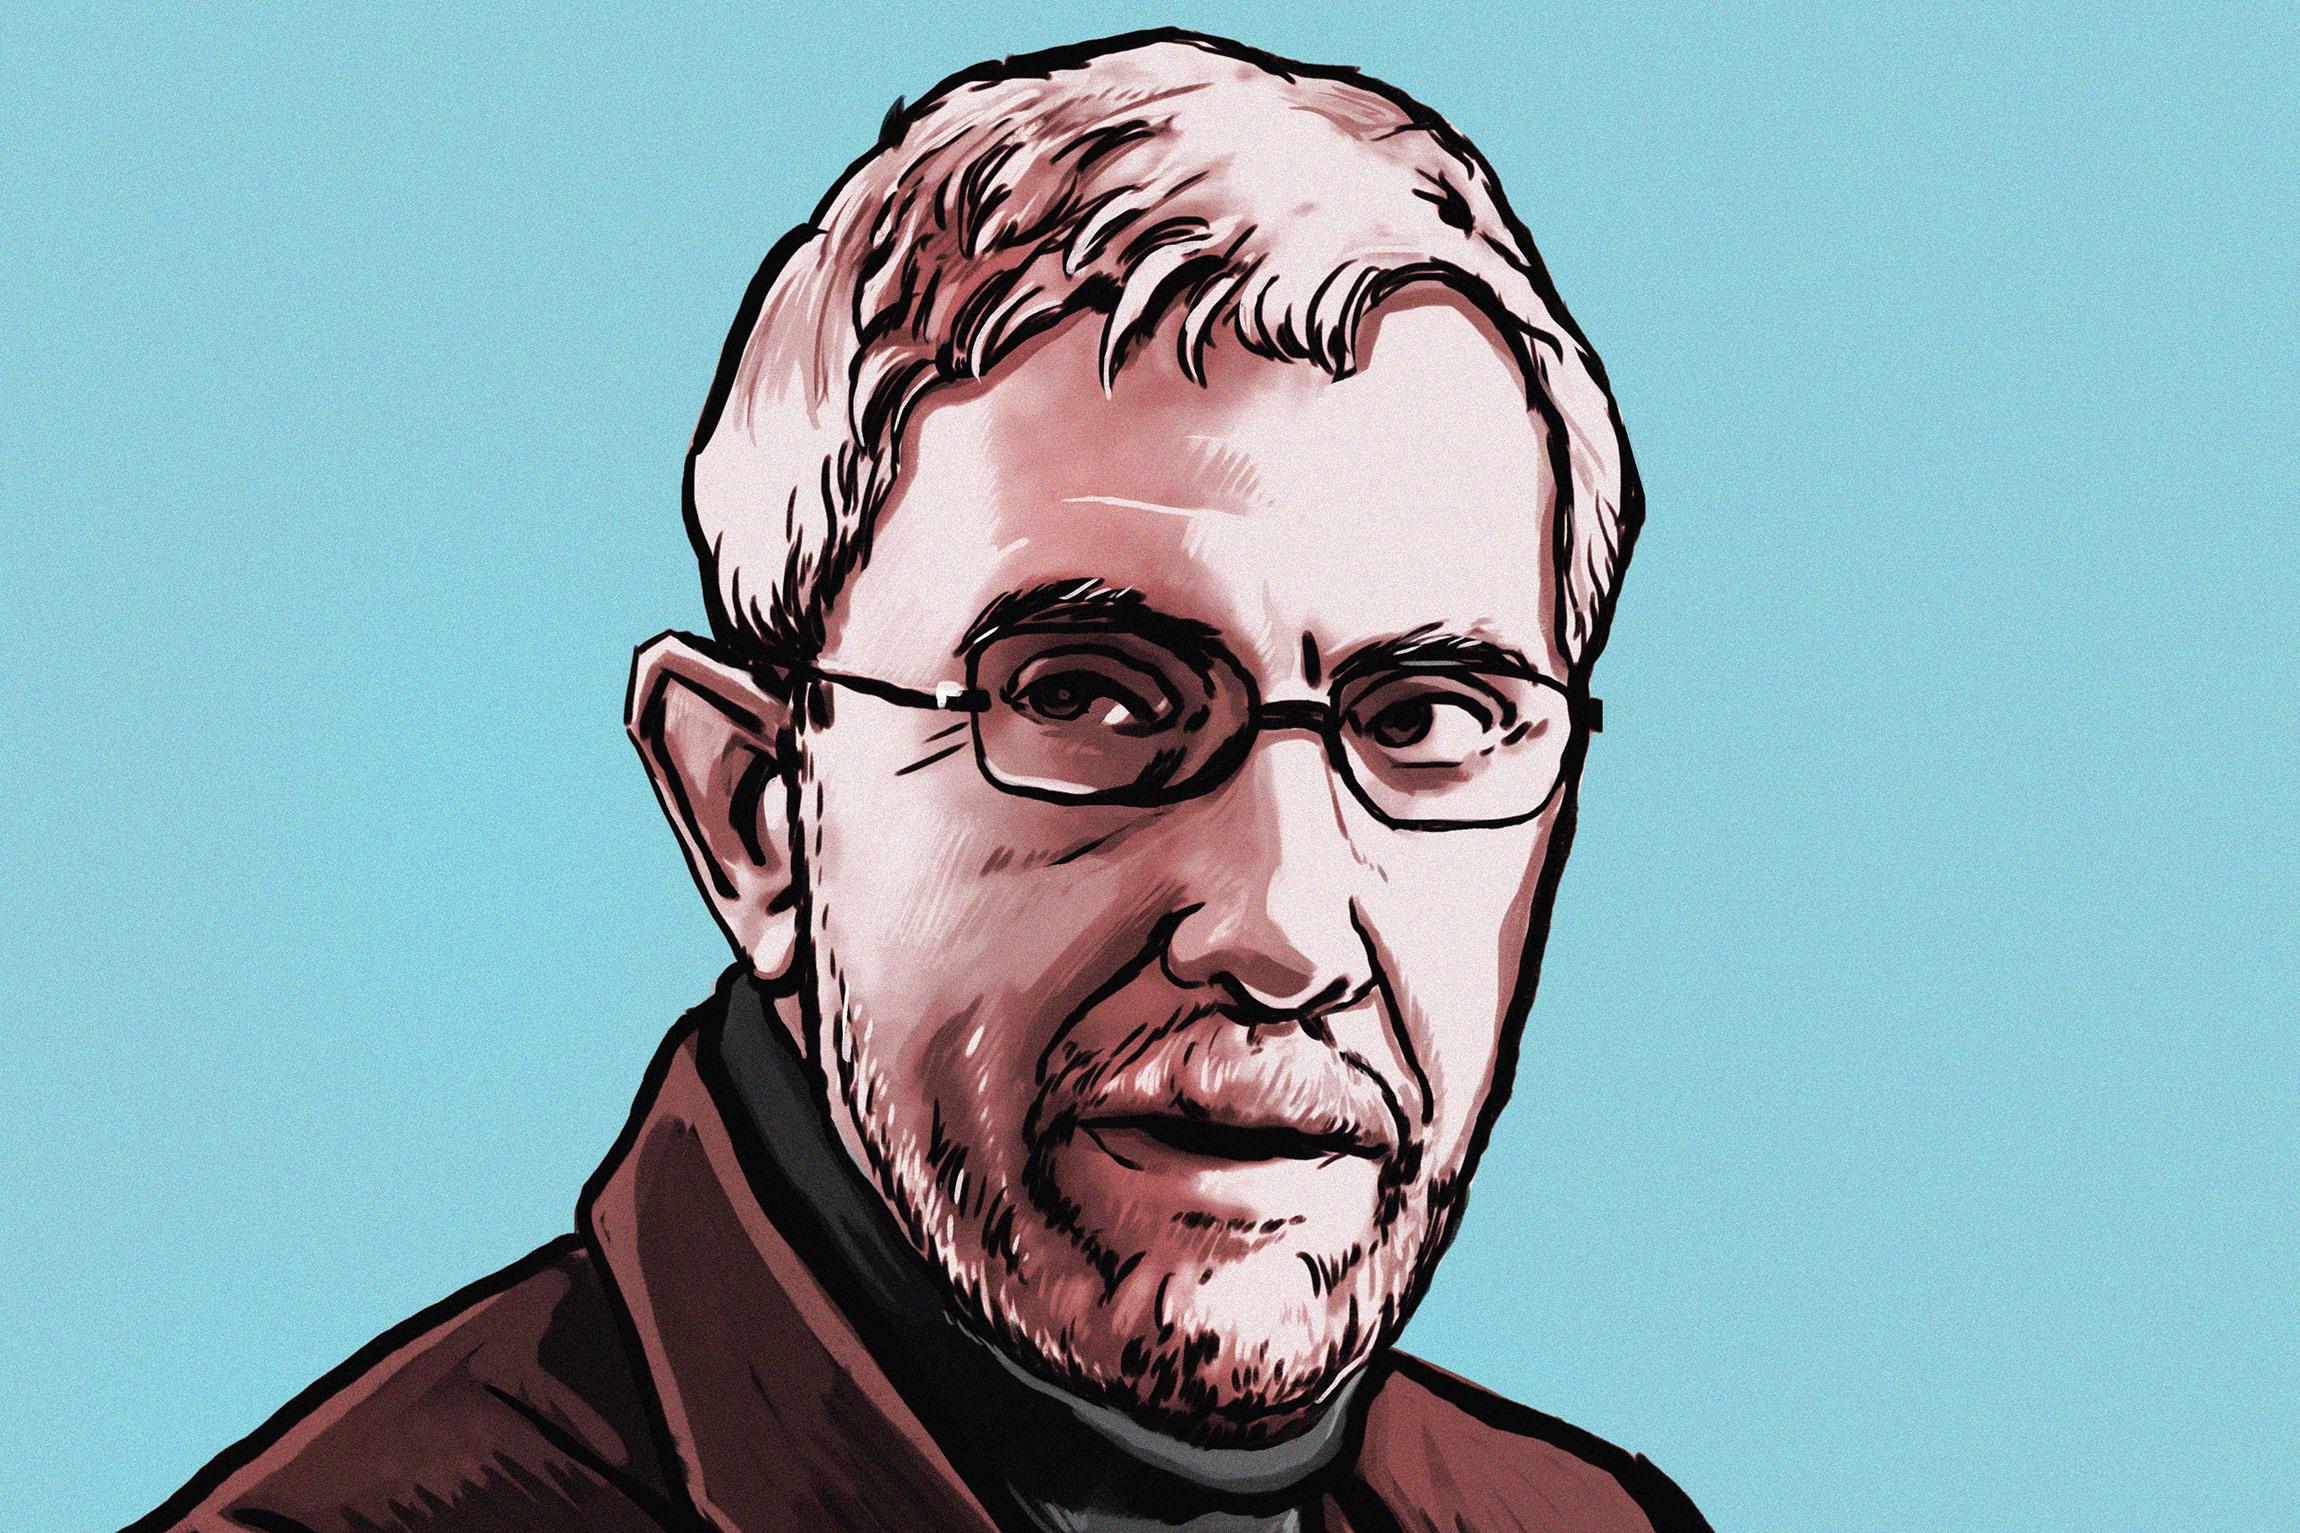 Ezra Klein interviews Paul Krugman on deficits, health care, and ...